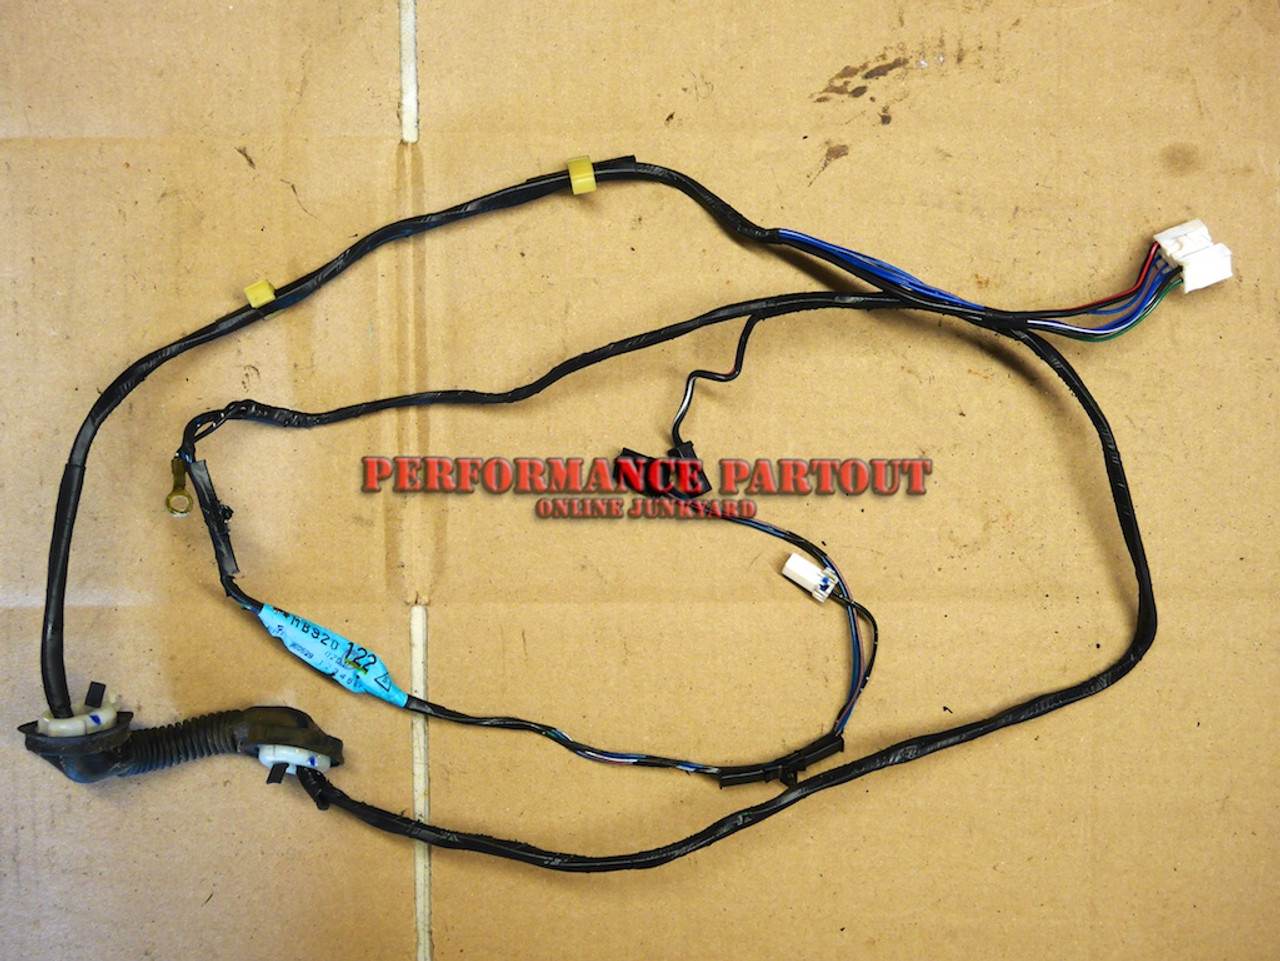 Hatch Wiring Harness | Wiring Diagram Ebook on 1999 jeep grand cherokee wiring diagram, 2009 subaru forester wiring diagram, 2010 jeep commander wiring diagram, jeep liberty tail light wiring diagram, 2005 jeep grand cherokee wiring diagram, 2001 dodge grand caravan wiring diagram, jeep liberty cooling system diagram, 2012 jeep grand cherokee wiring diagram, 2007 jeep grand cherokee wiring diagram, 2008 chrysler 300 wiring diagram, 2004 chevrolet tahoe wiring diagram, jeep liberty ac wiring diagram, 2011 jeep grand cherokee wiring diagram, jeep liberty fuse box diagram, 2008 jeep liberty wiring diagram, 1998 honda odyssey wiring diagram, 2006 jeep tj wiring-diagram, jeep liberty trailer wiring diagram, 2006 jeep grand cherokee wiring diagram, 2006 jeep liberty parts diagram,